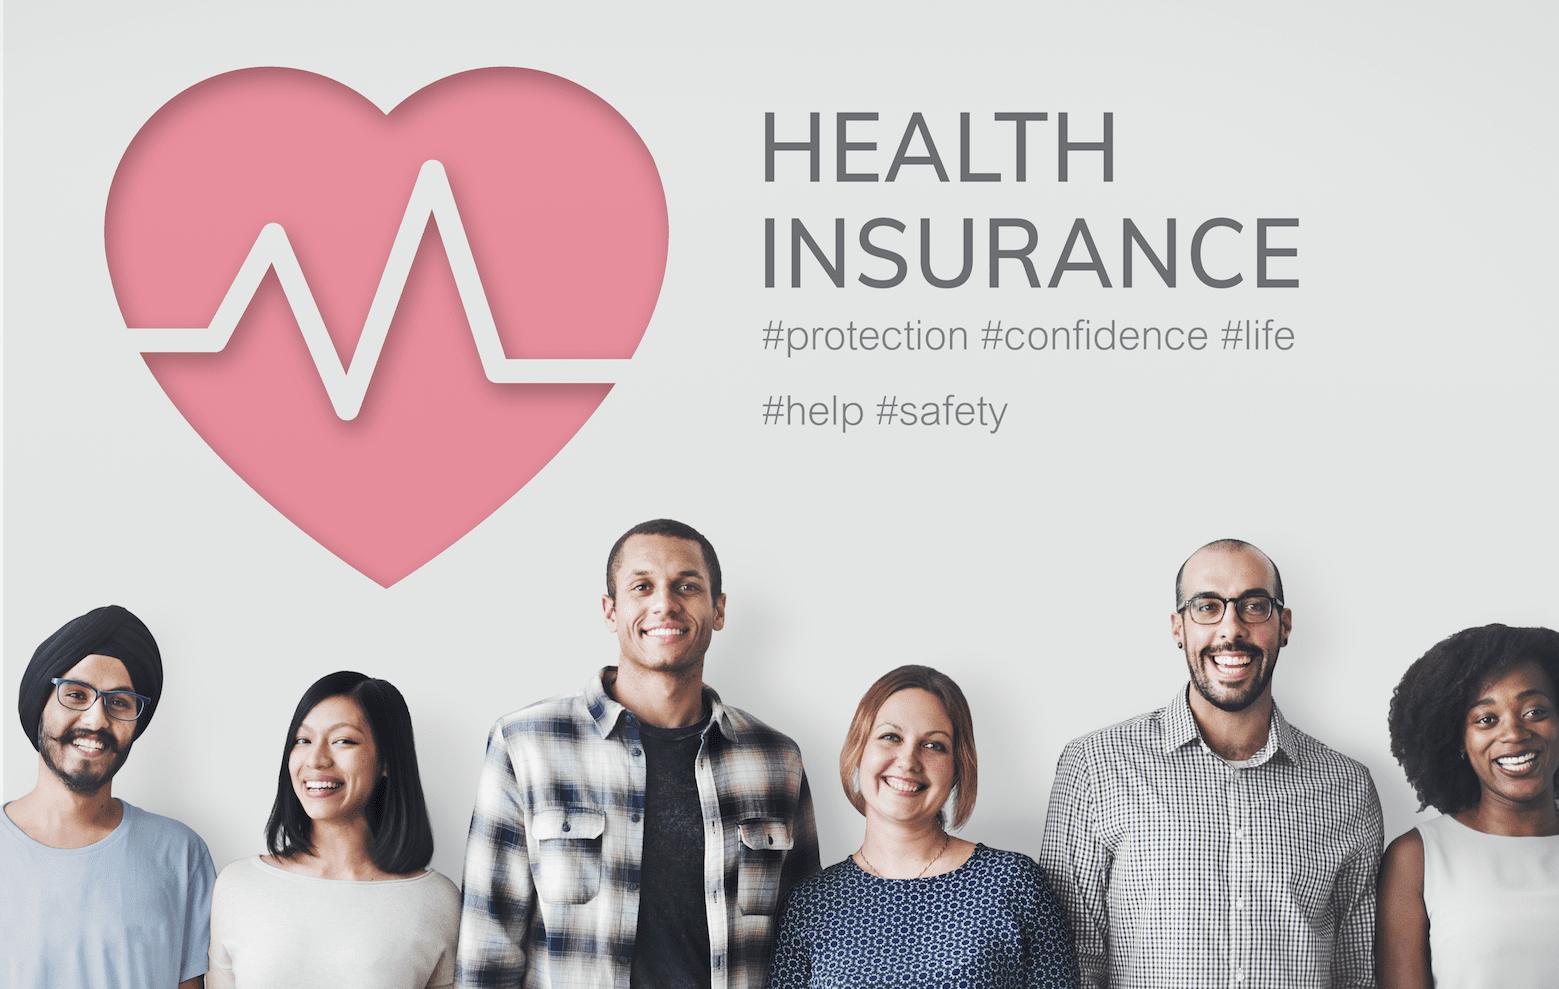 personal insurance, health insurance